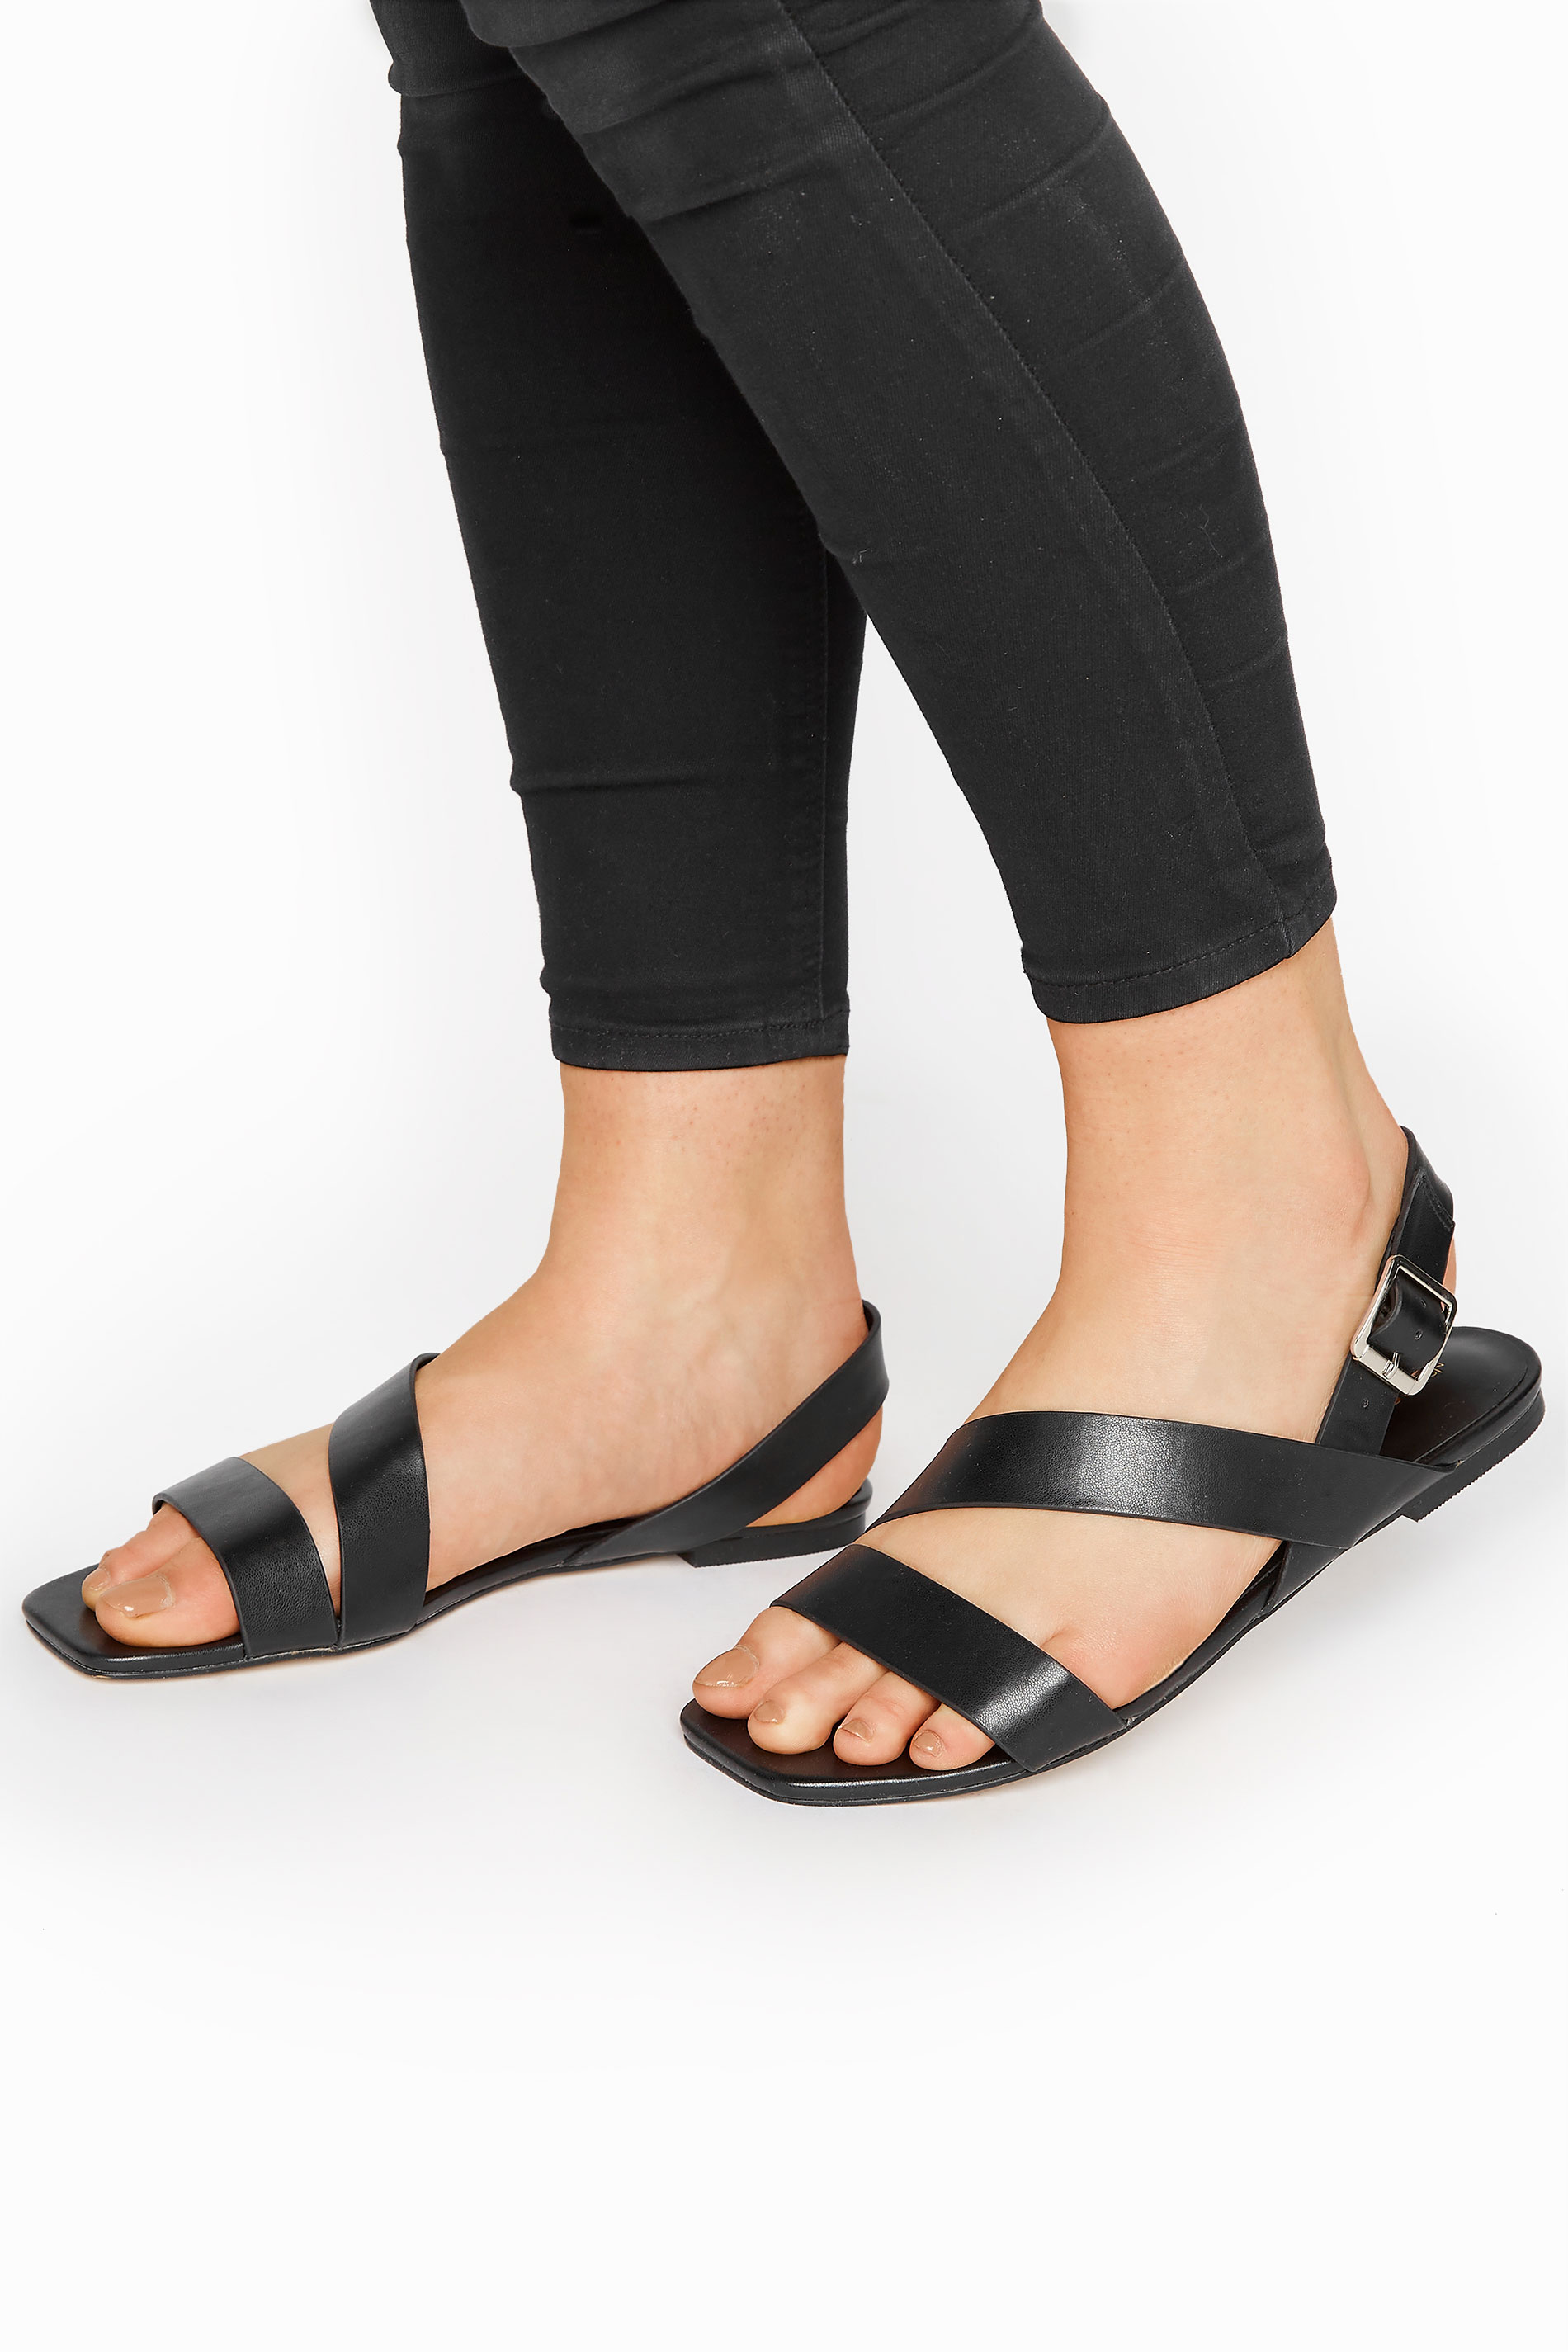 LTS Black Crossover Strap Sandals_M.jpg